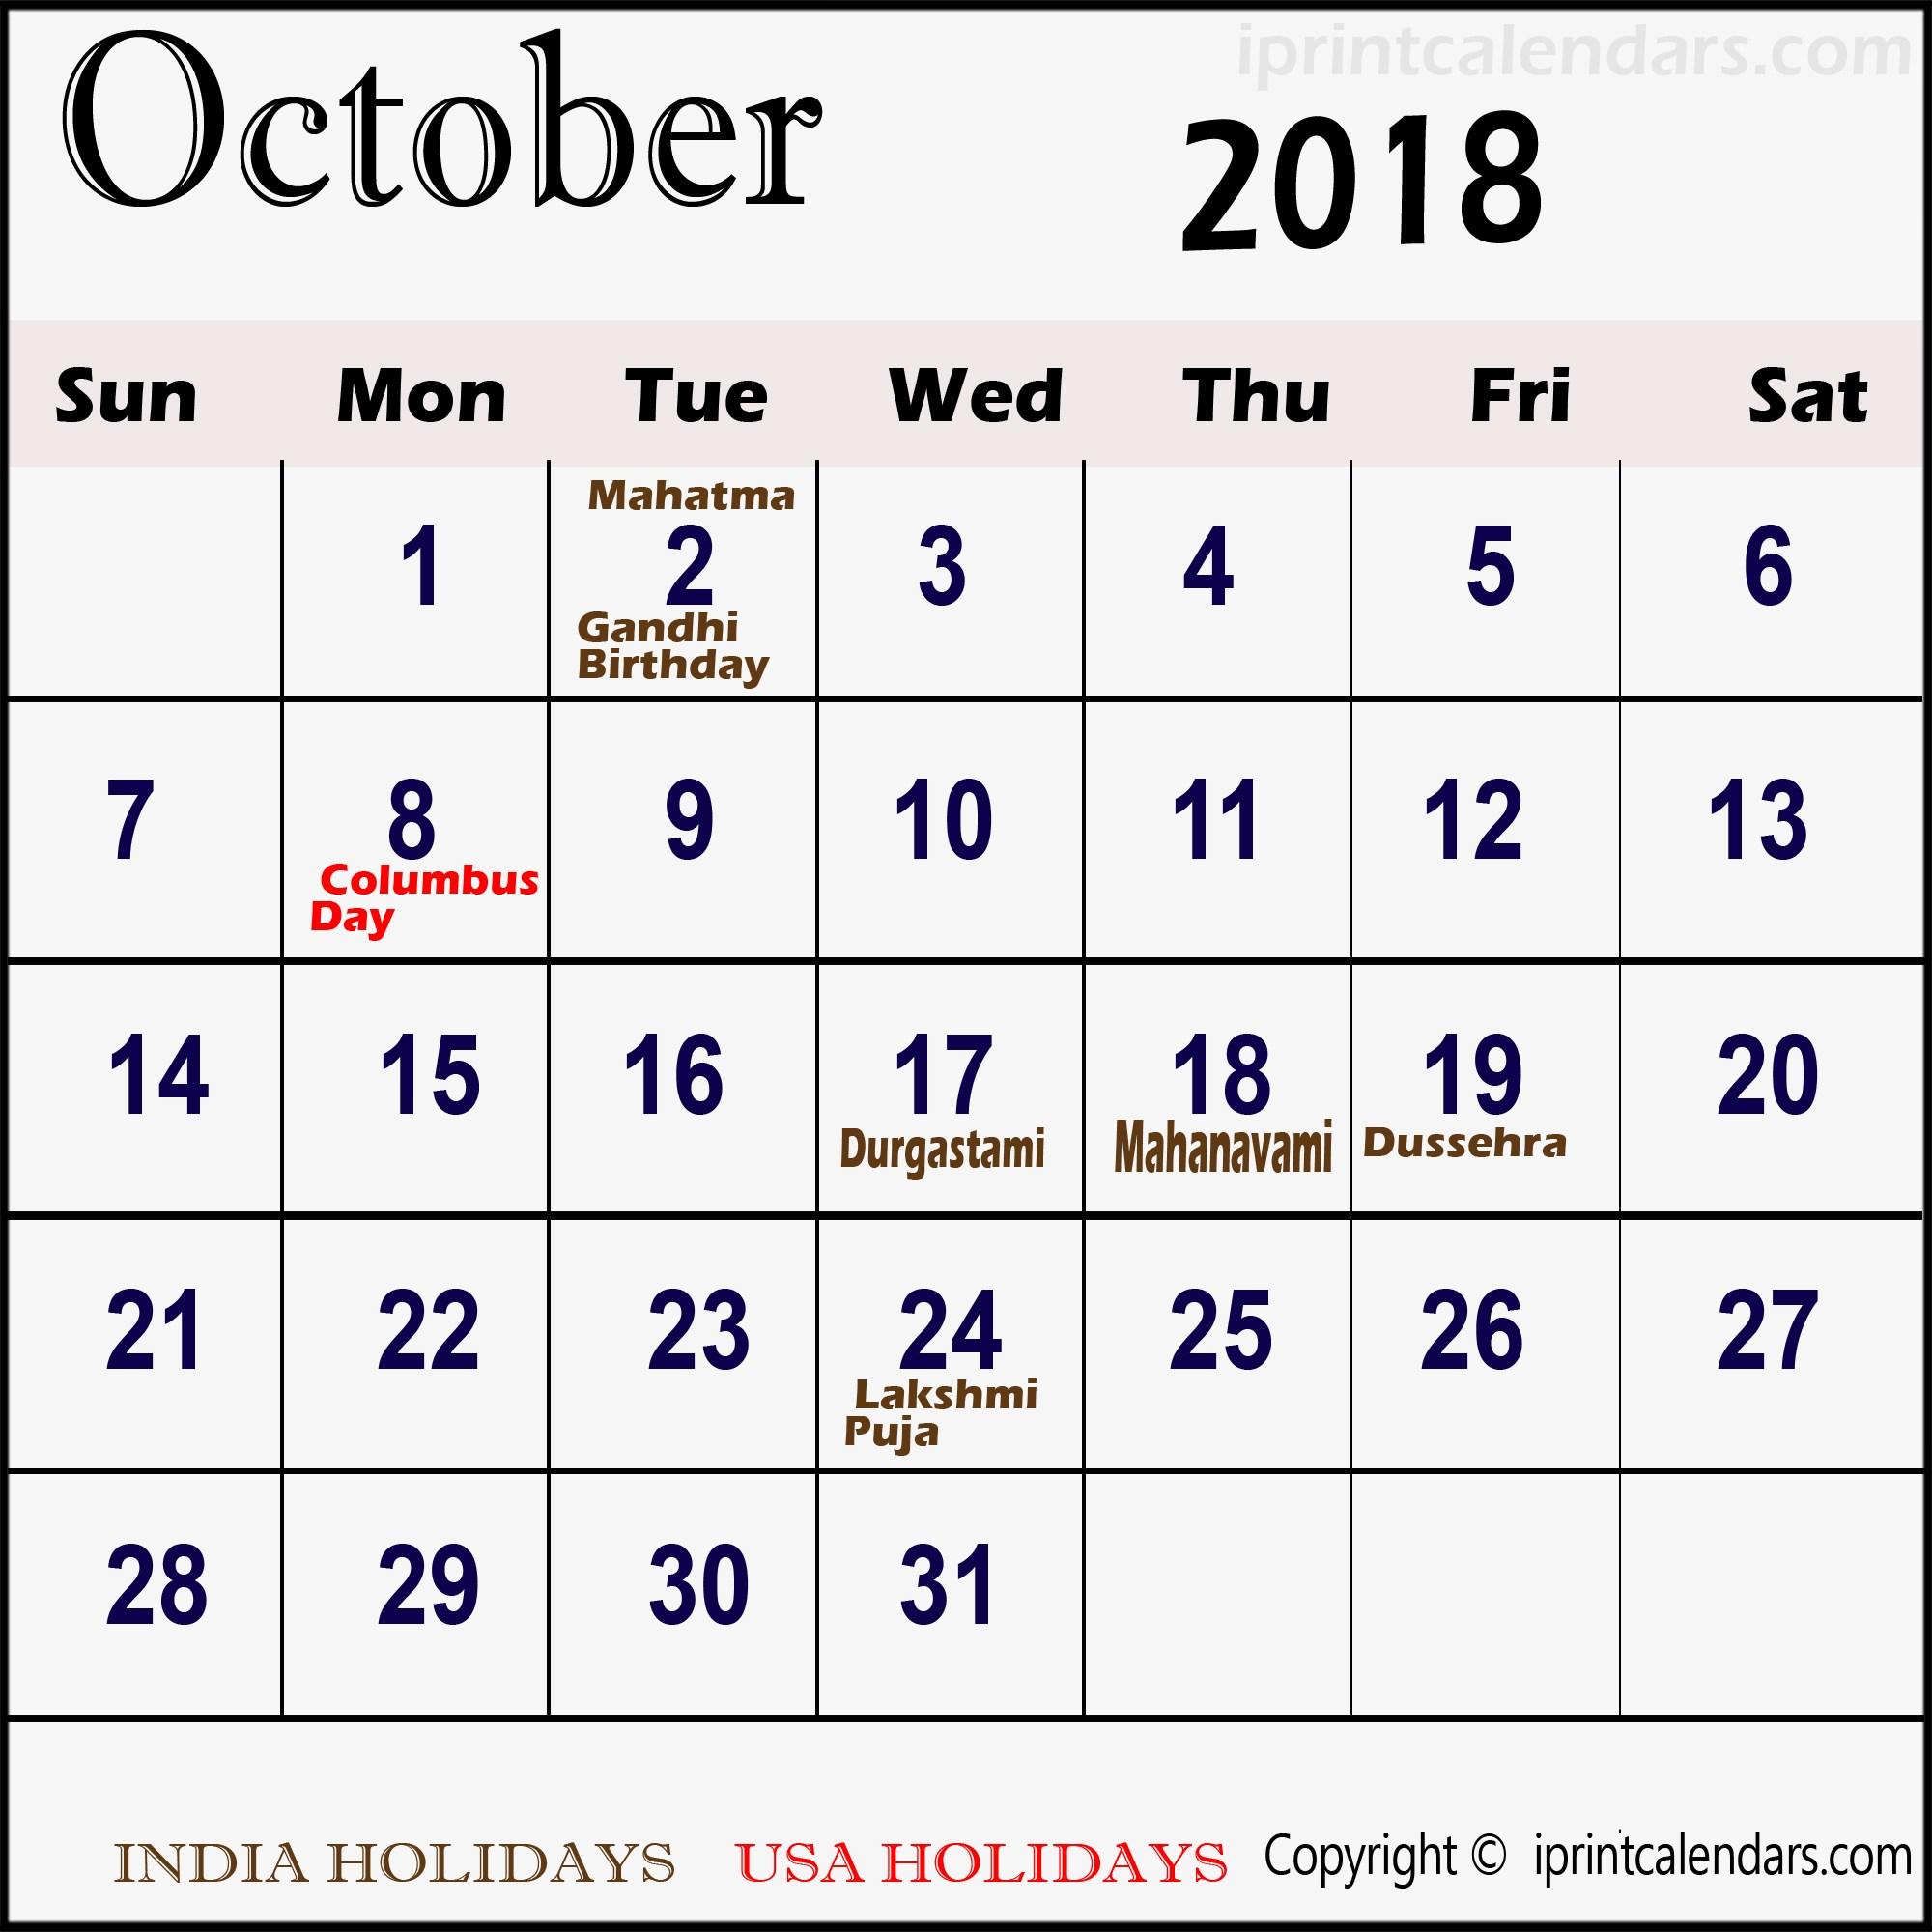 Calendar for October 2018 Malaysia